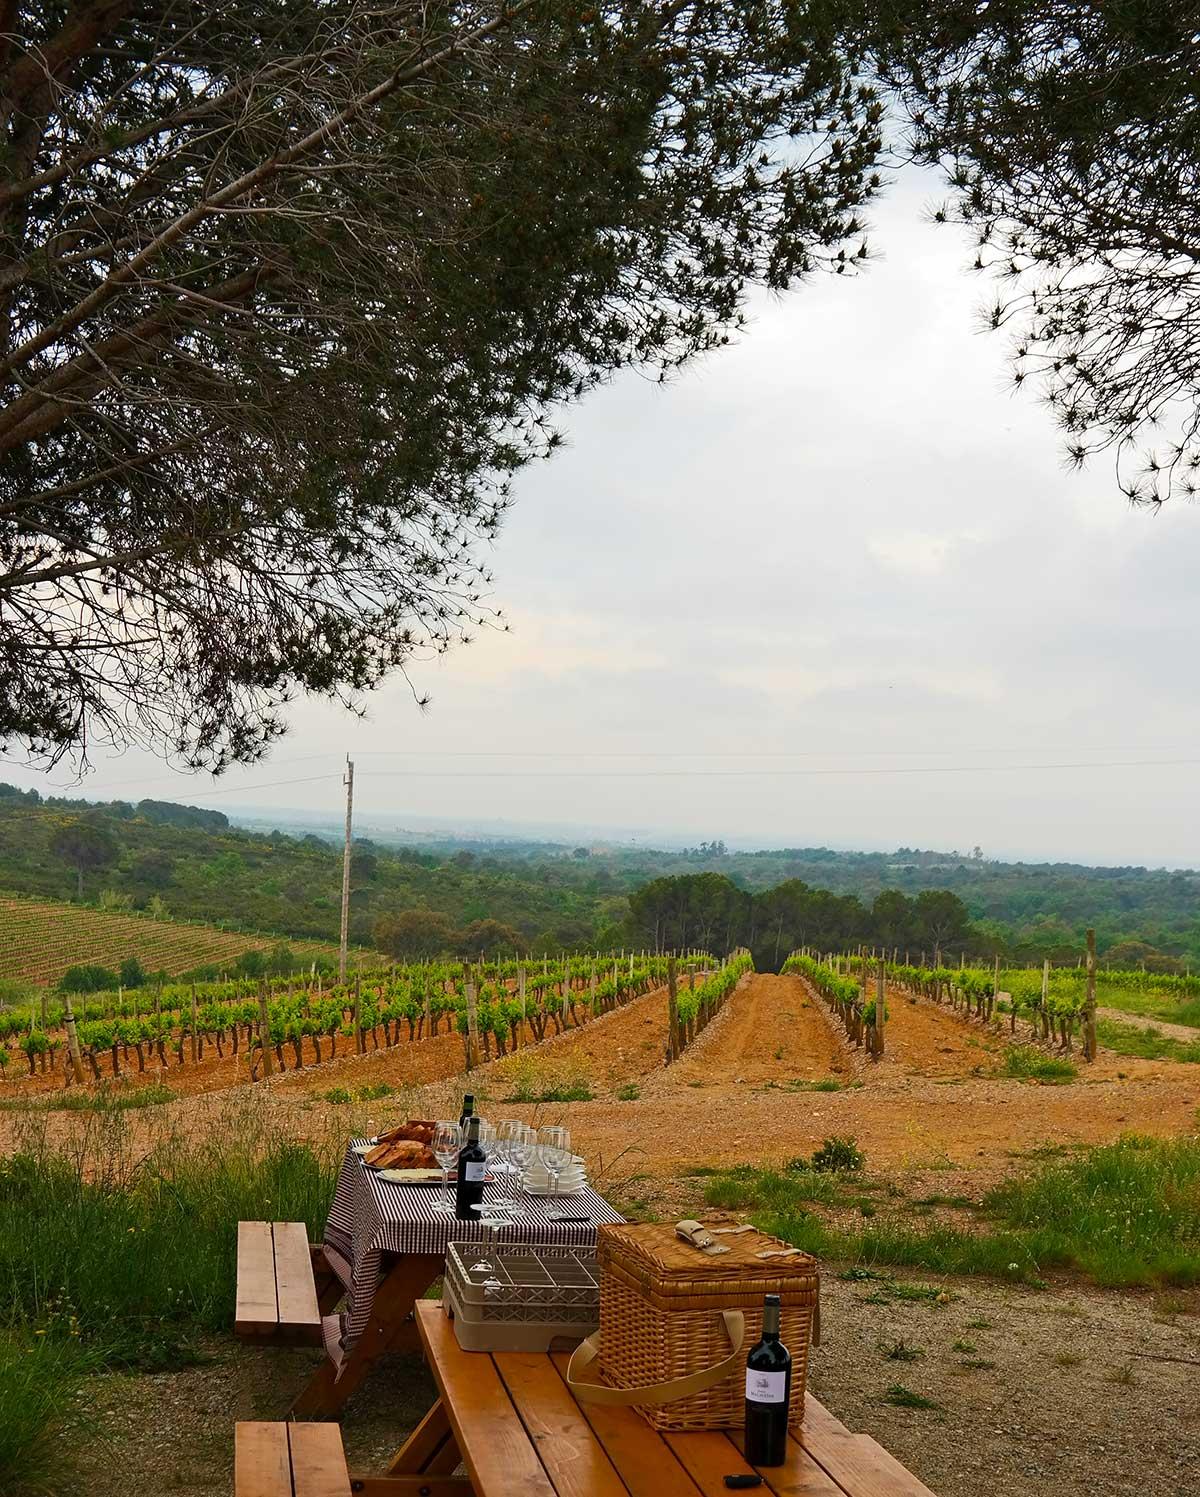 catalonia-spain-wine-vineyards-picnic